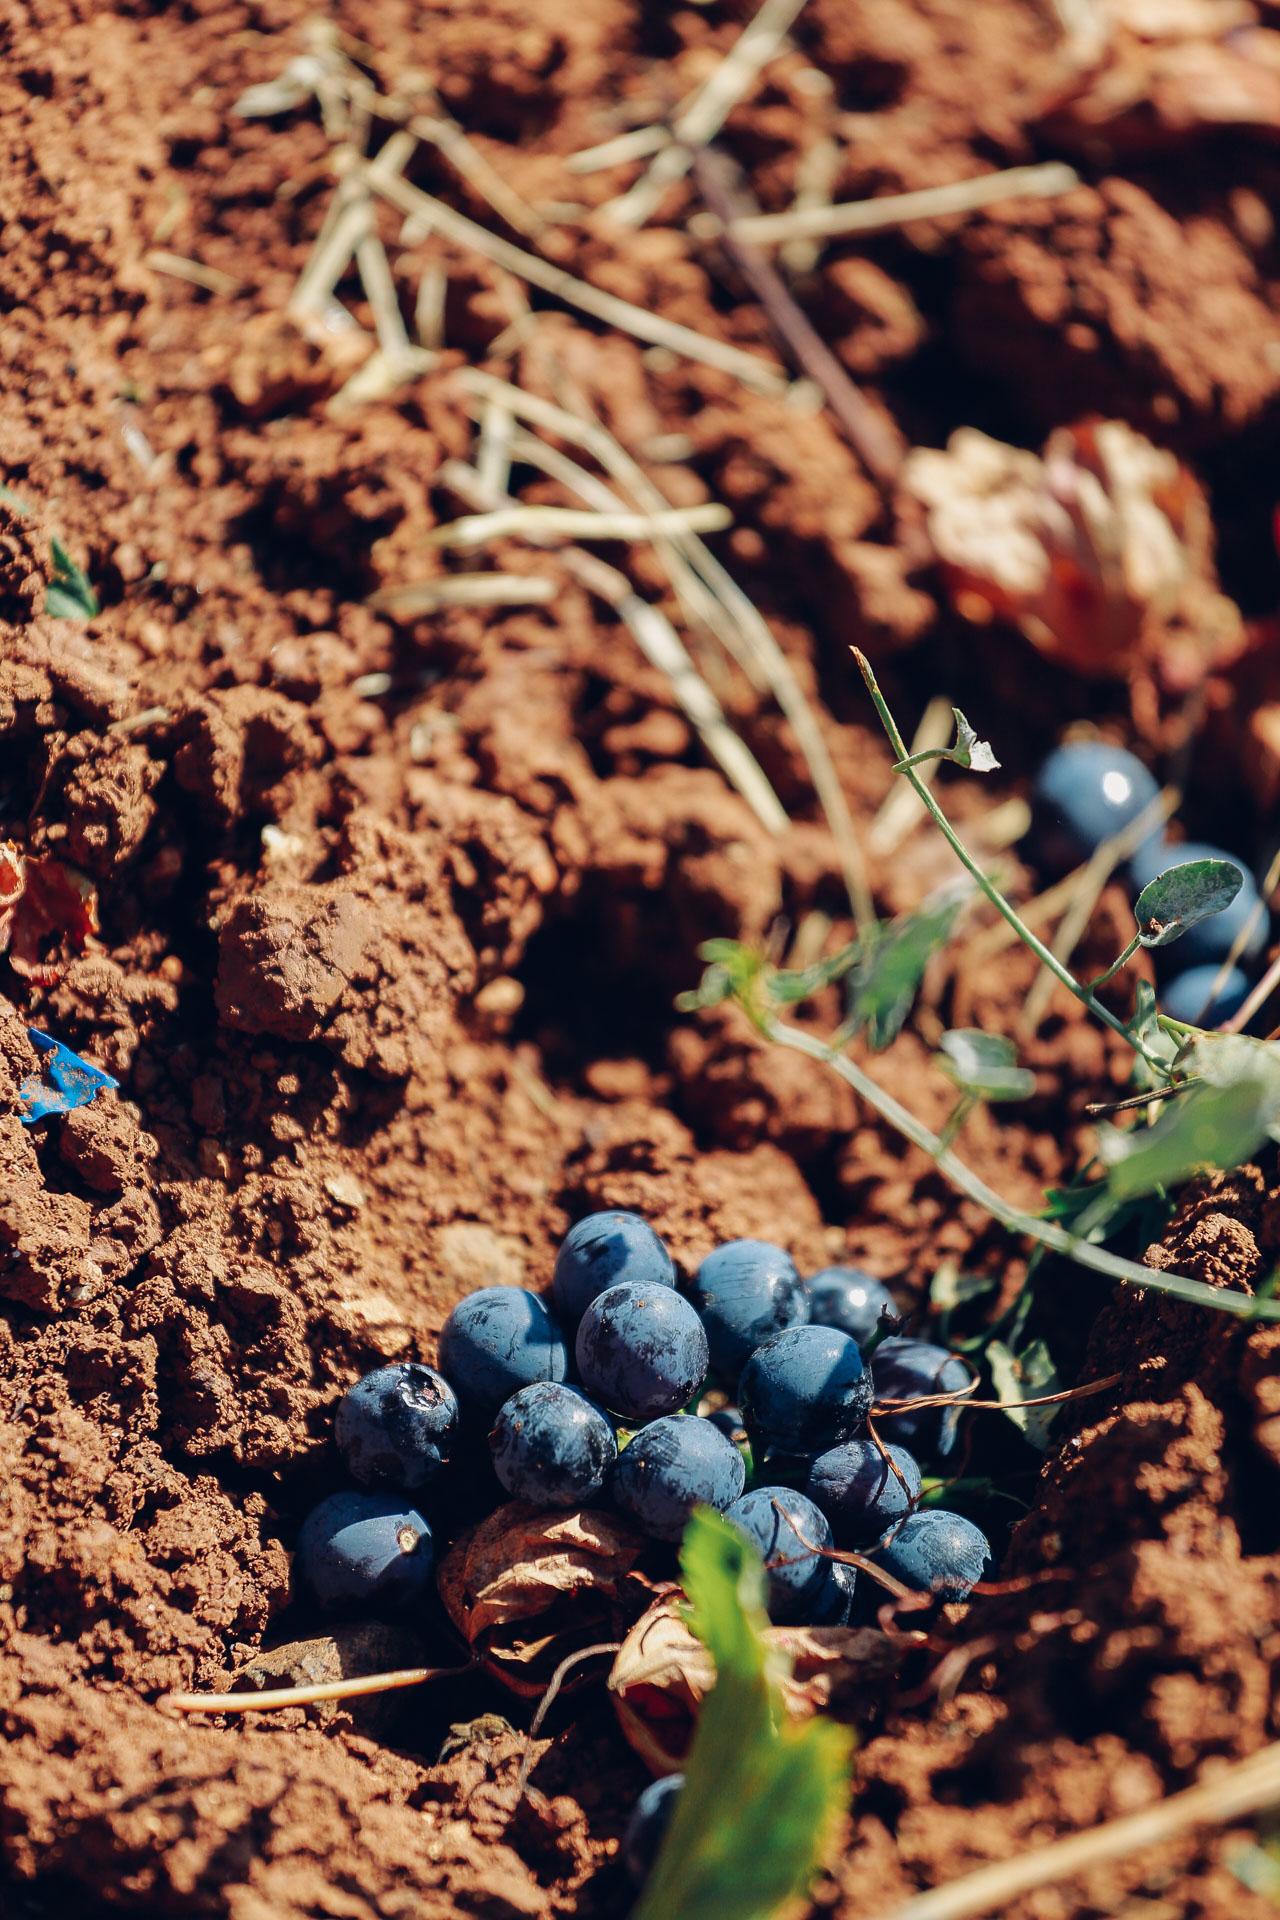 015-Sauro-maule-wineyards-organic-harvest-2016-_RUI7223_p_Lr_web_HD